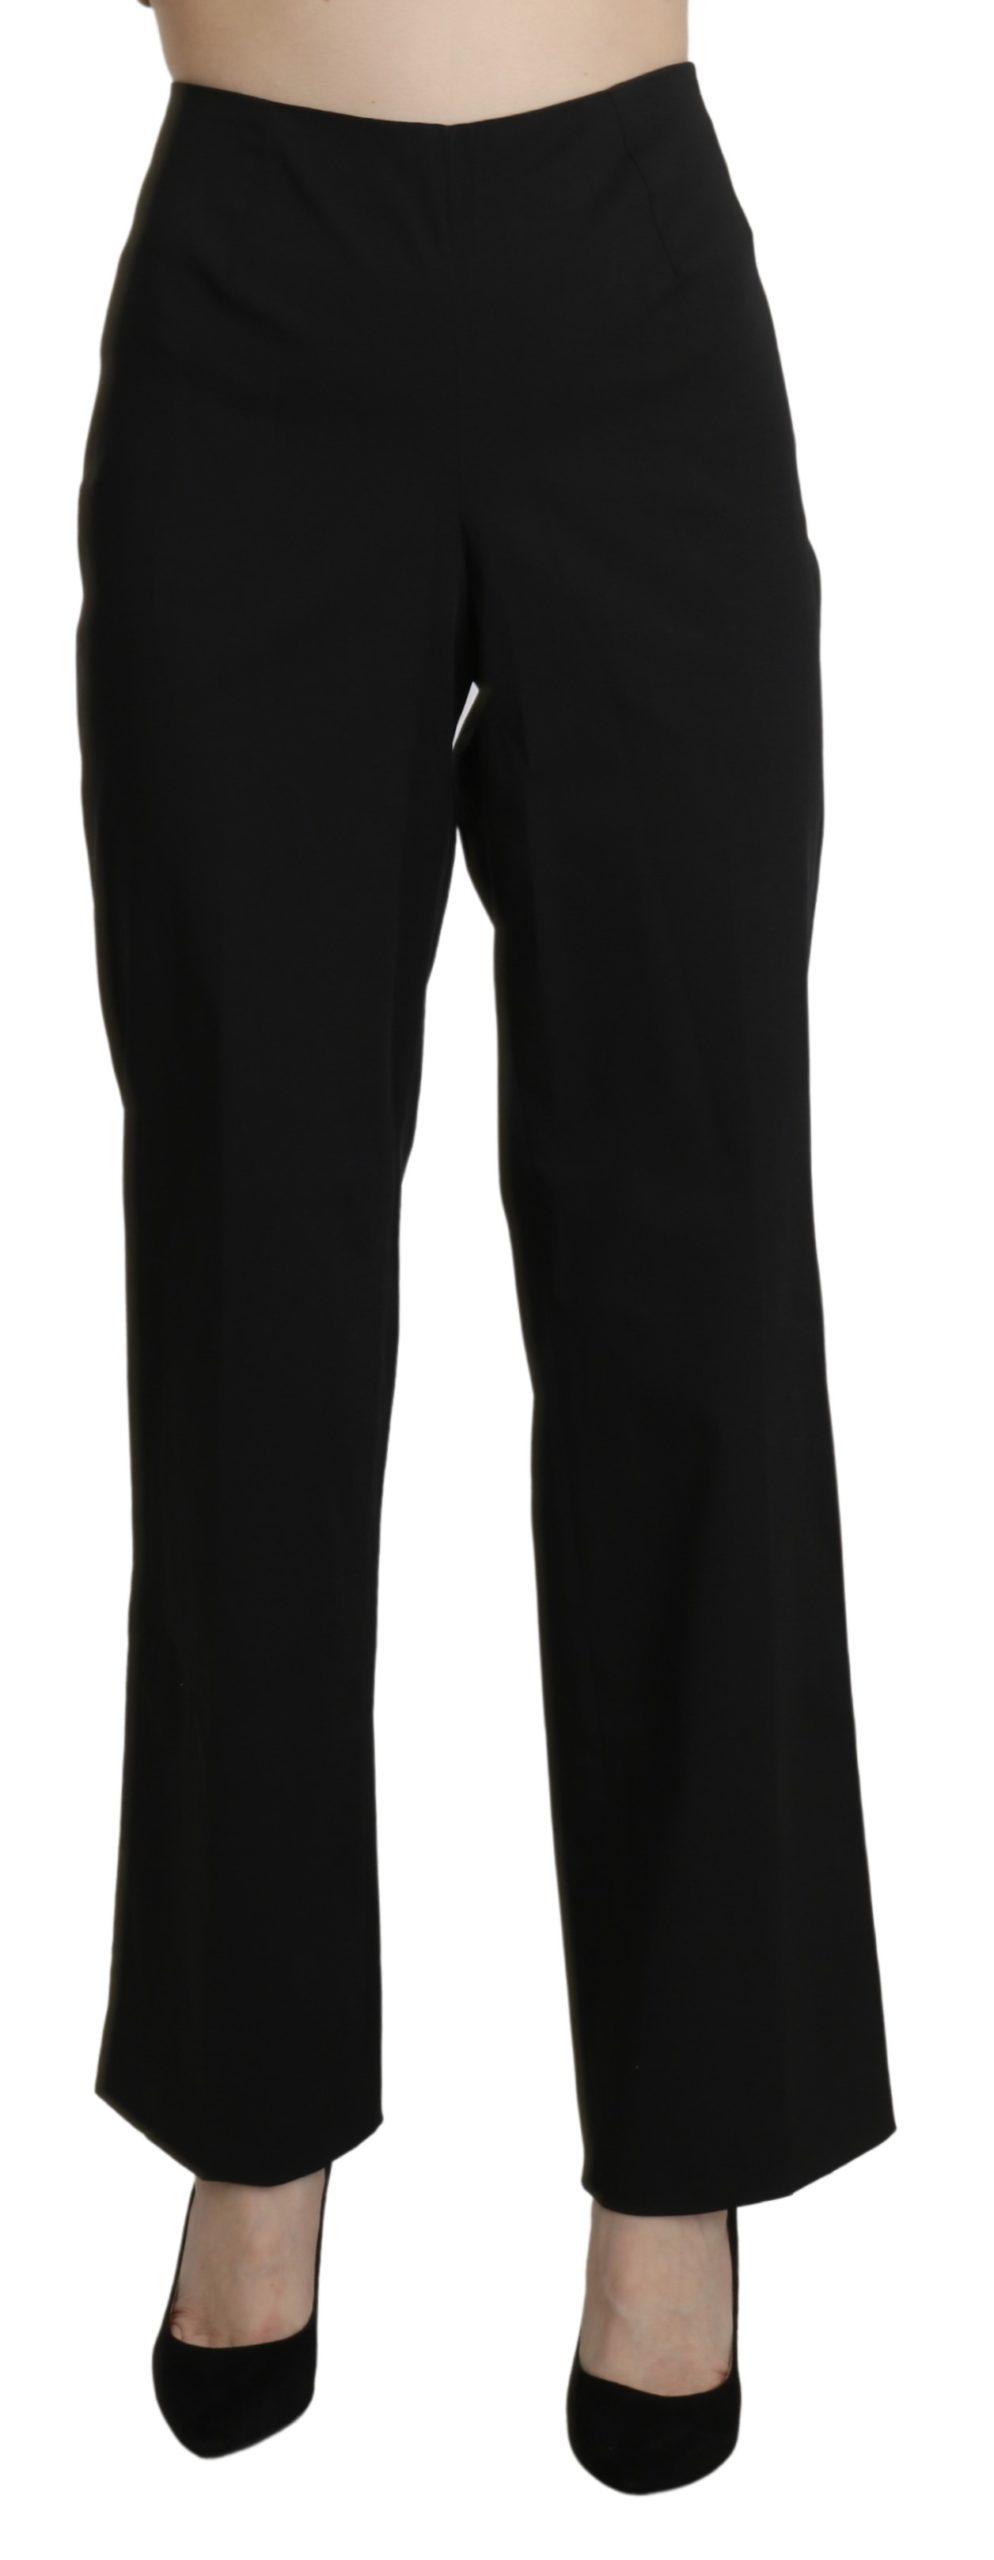 BENCIVENGA Women's High Waist Straight Trouser Black PAN71324-46 - IT46|XL